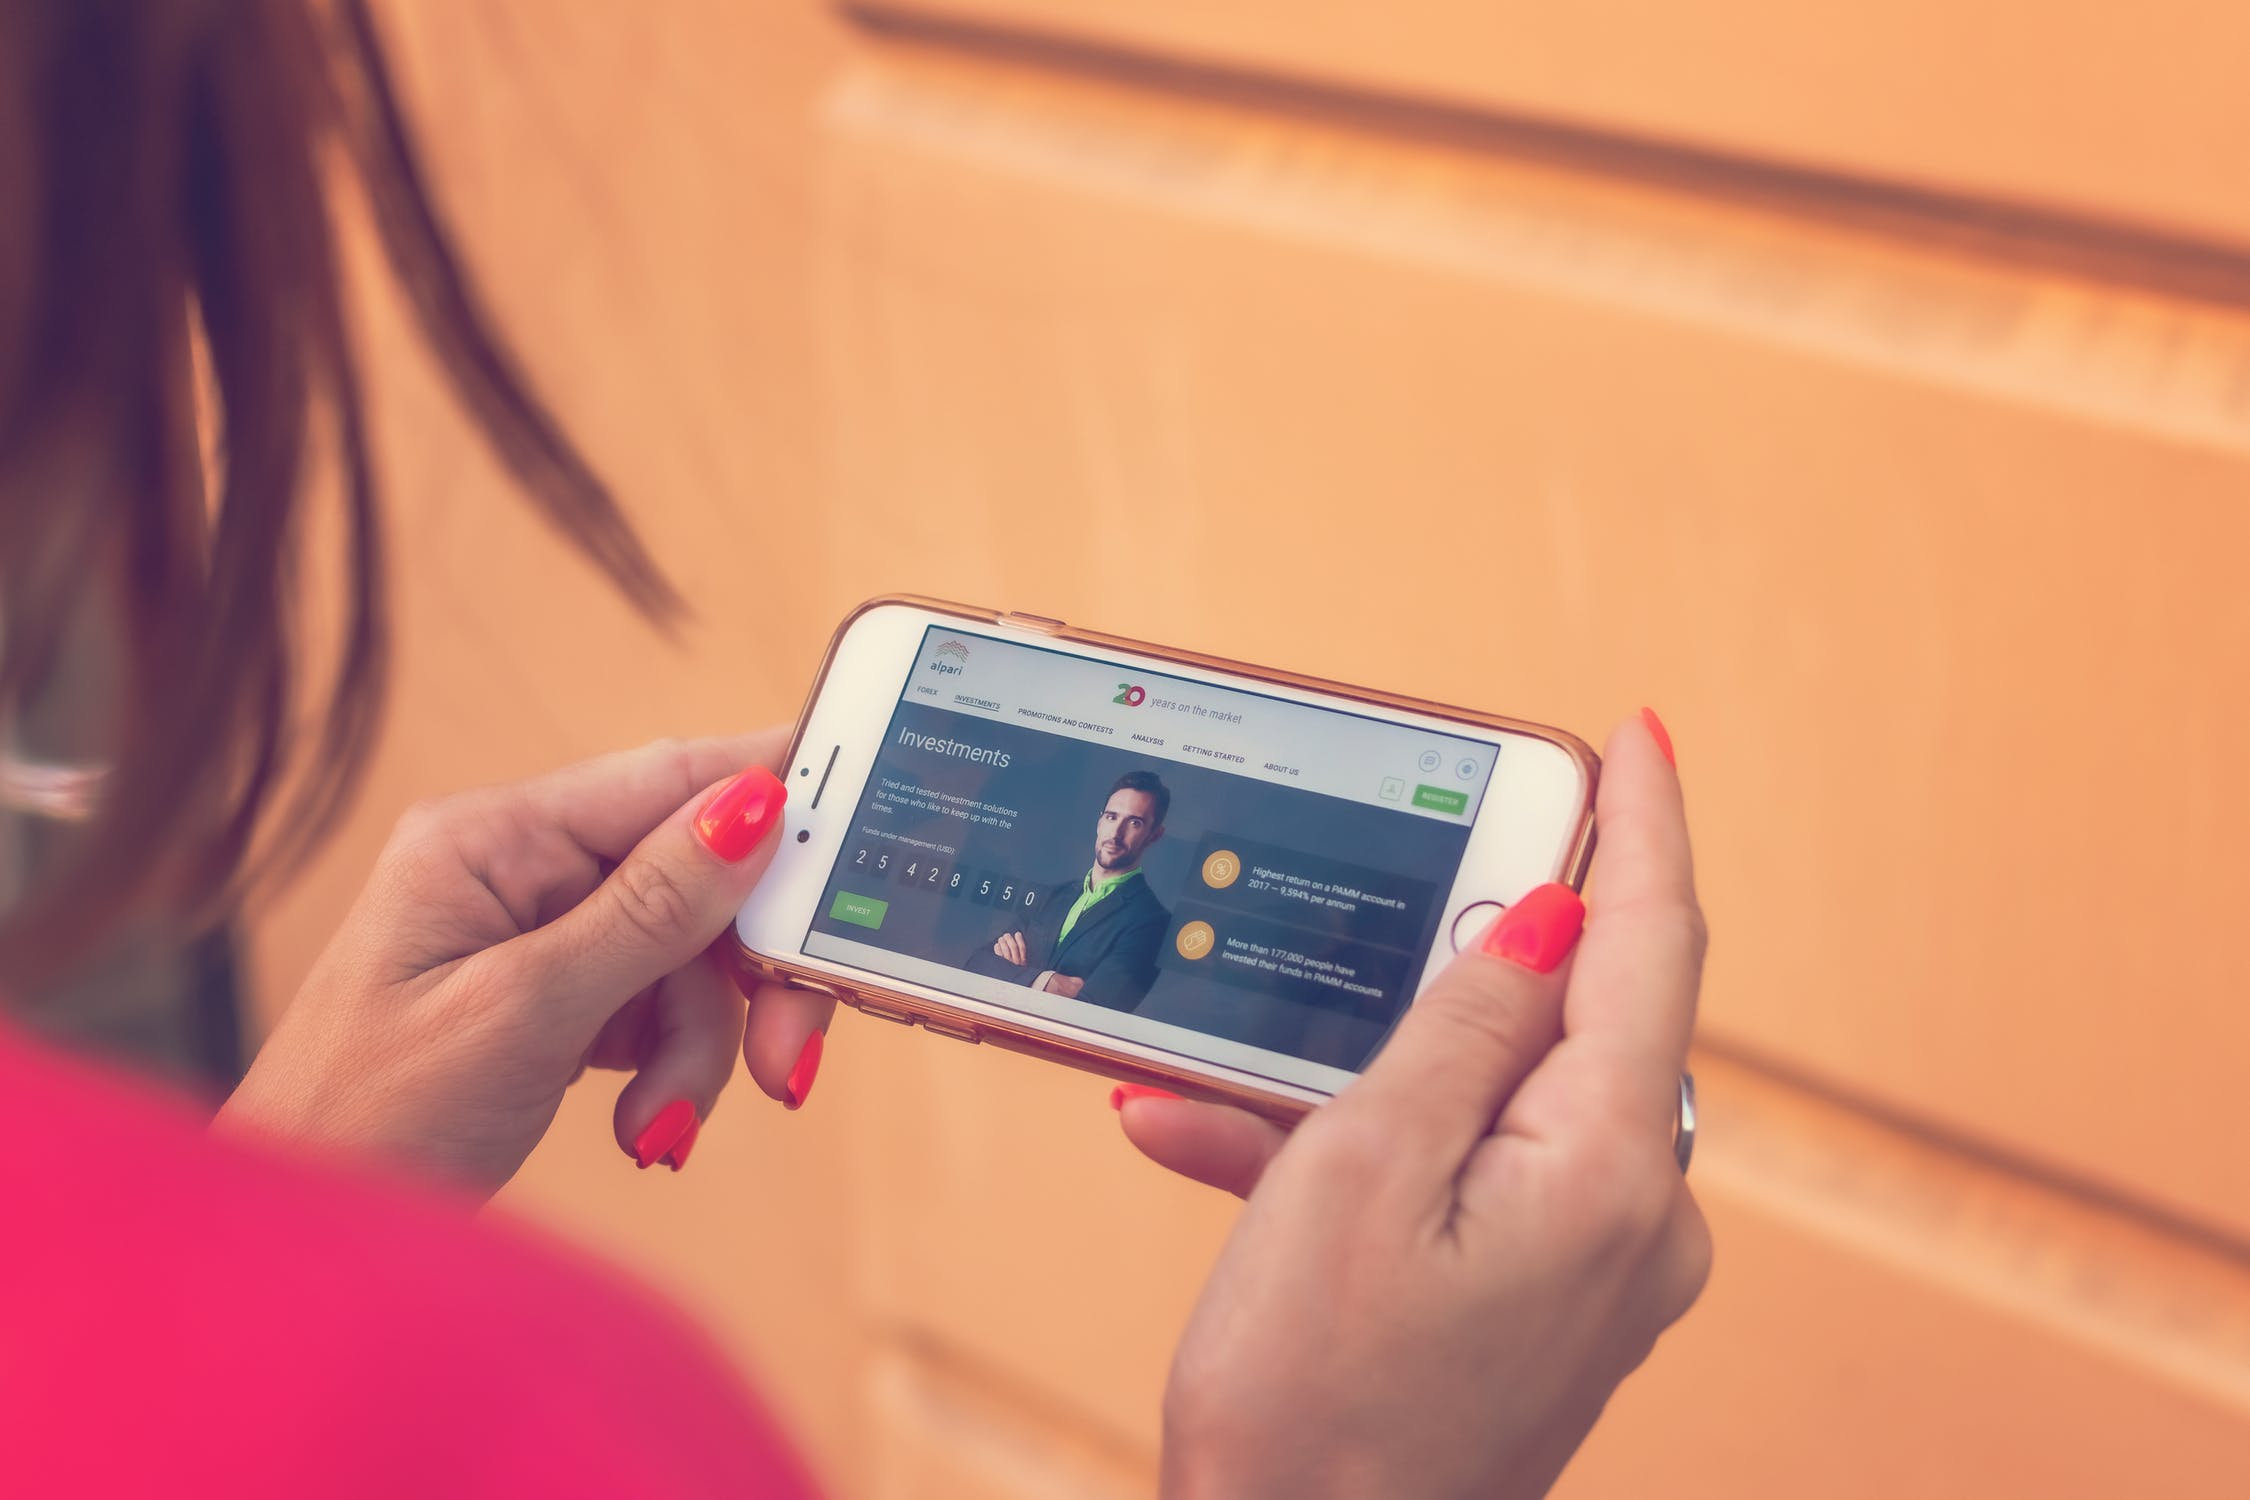 Gratis online dating KZN dating chat linjenummer